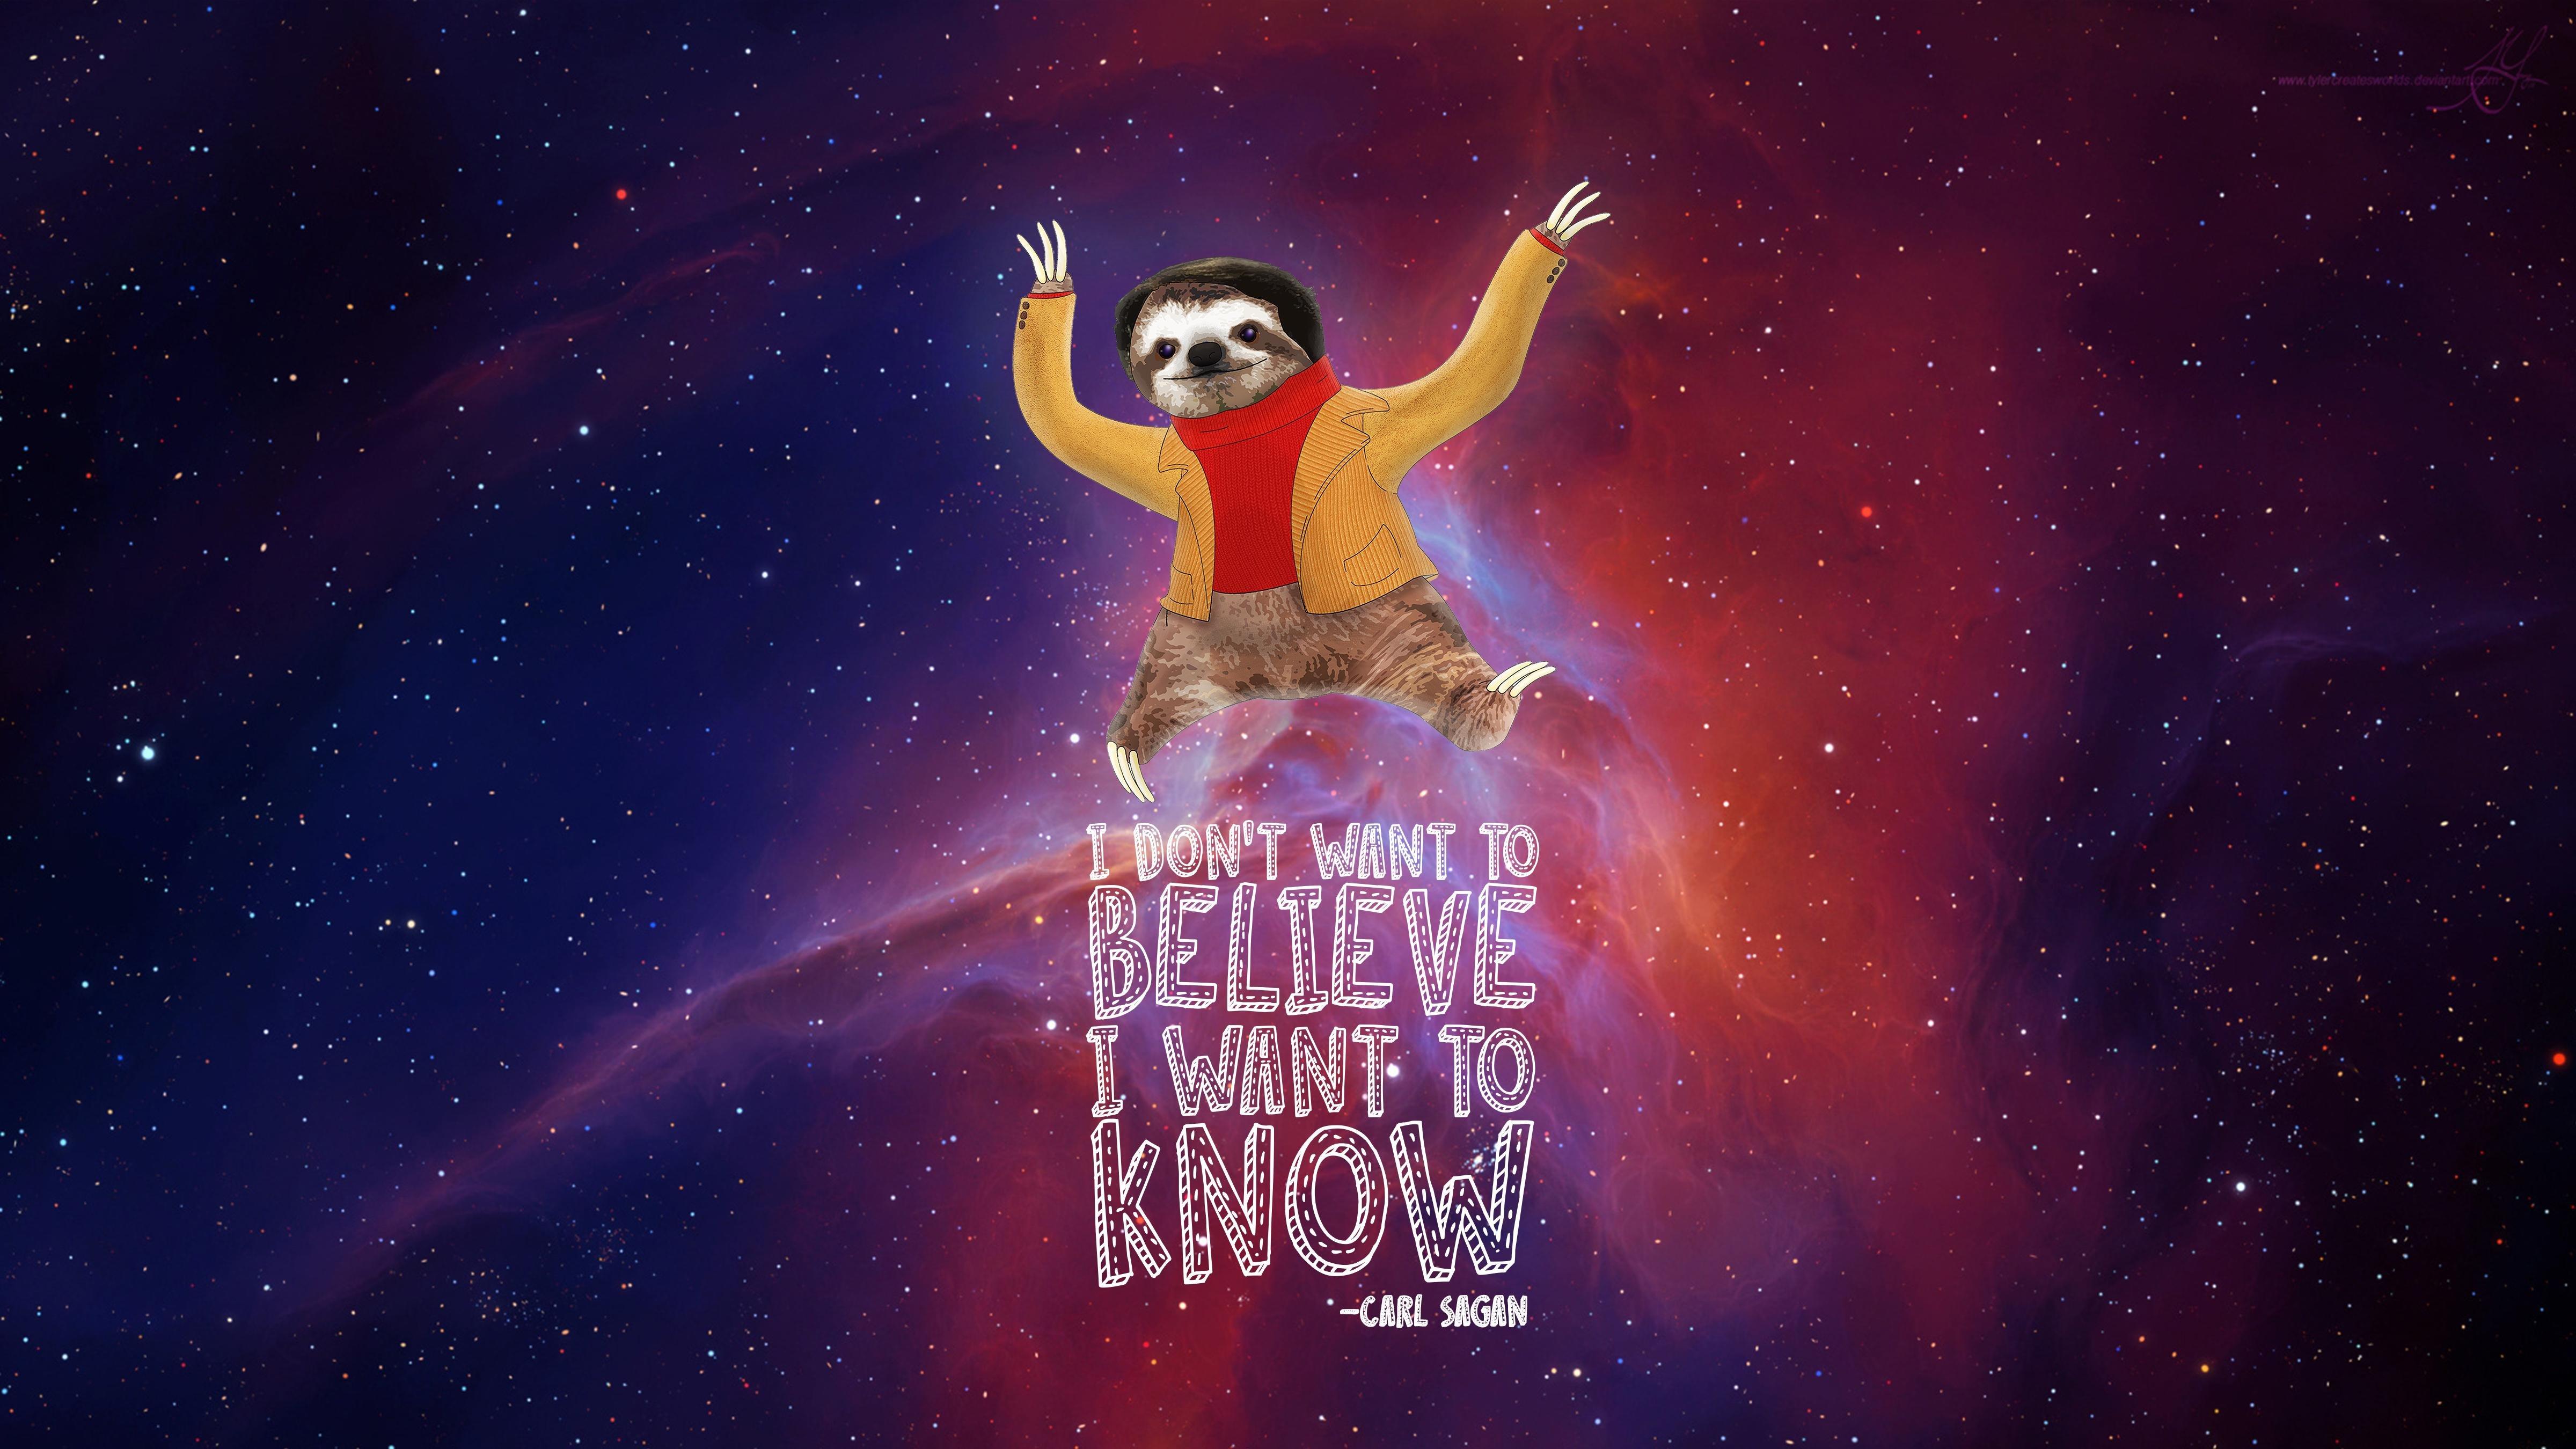 Carl Sagan Sloth 4K Wallpaper